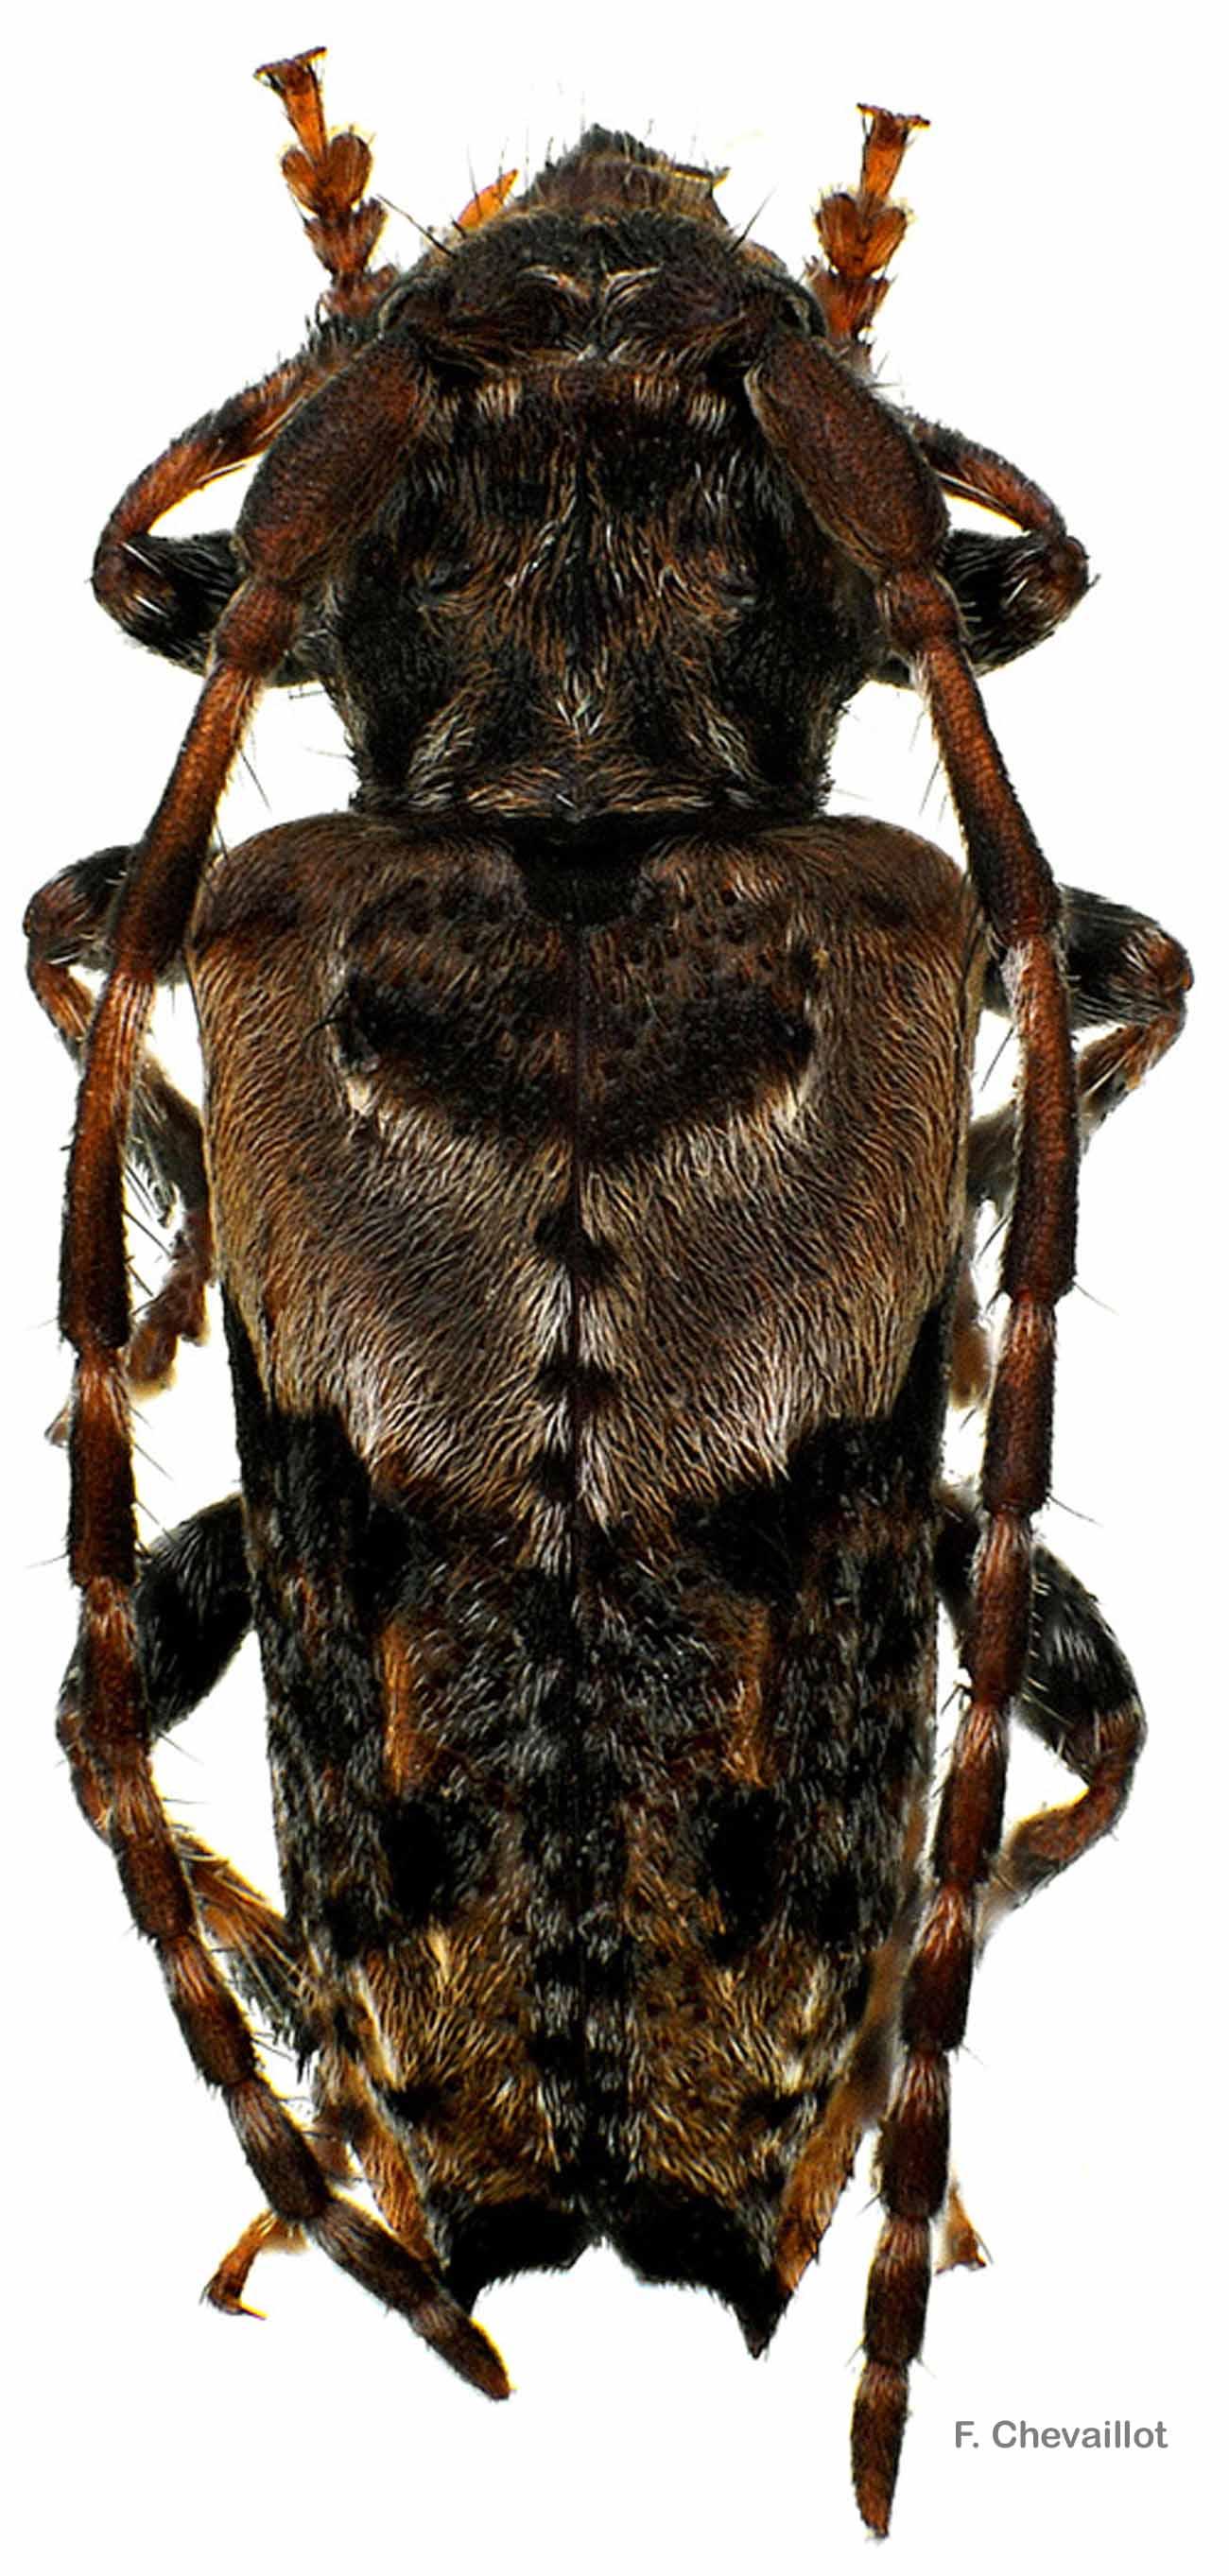 Pogonocherus hispidus